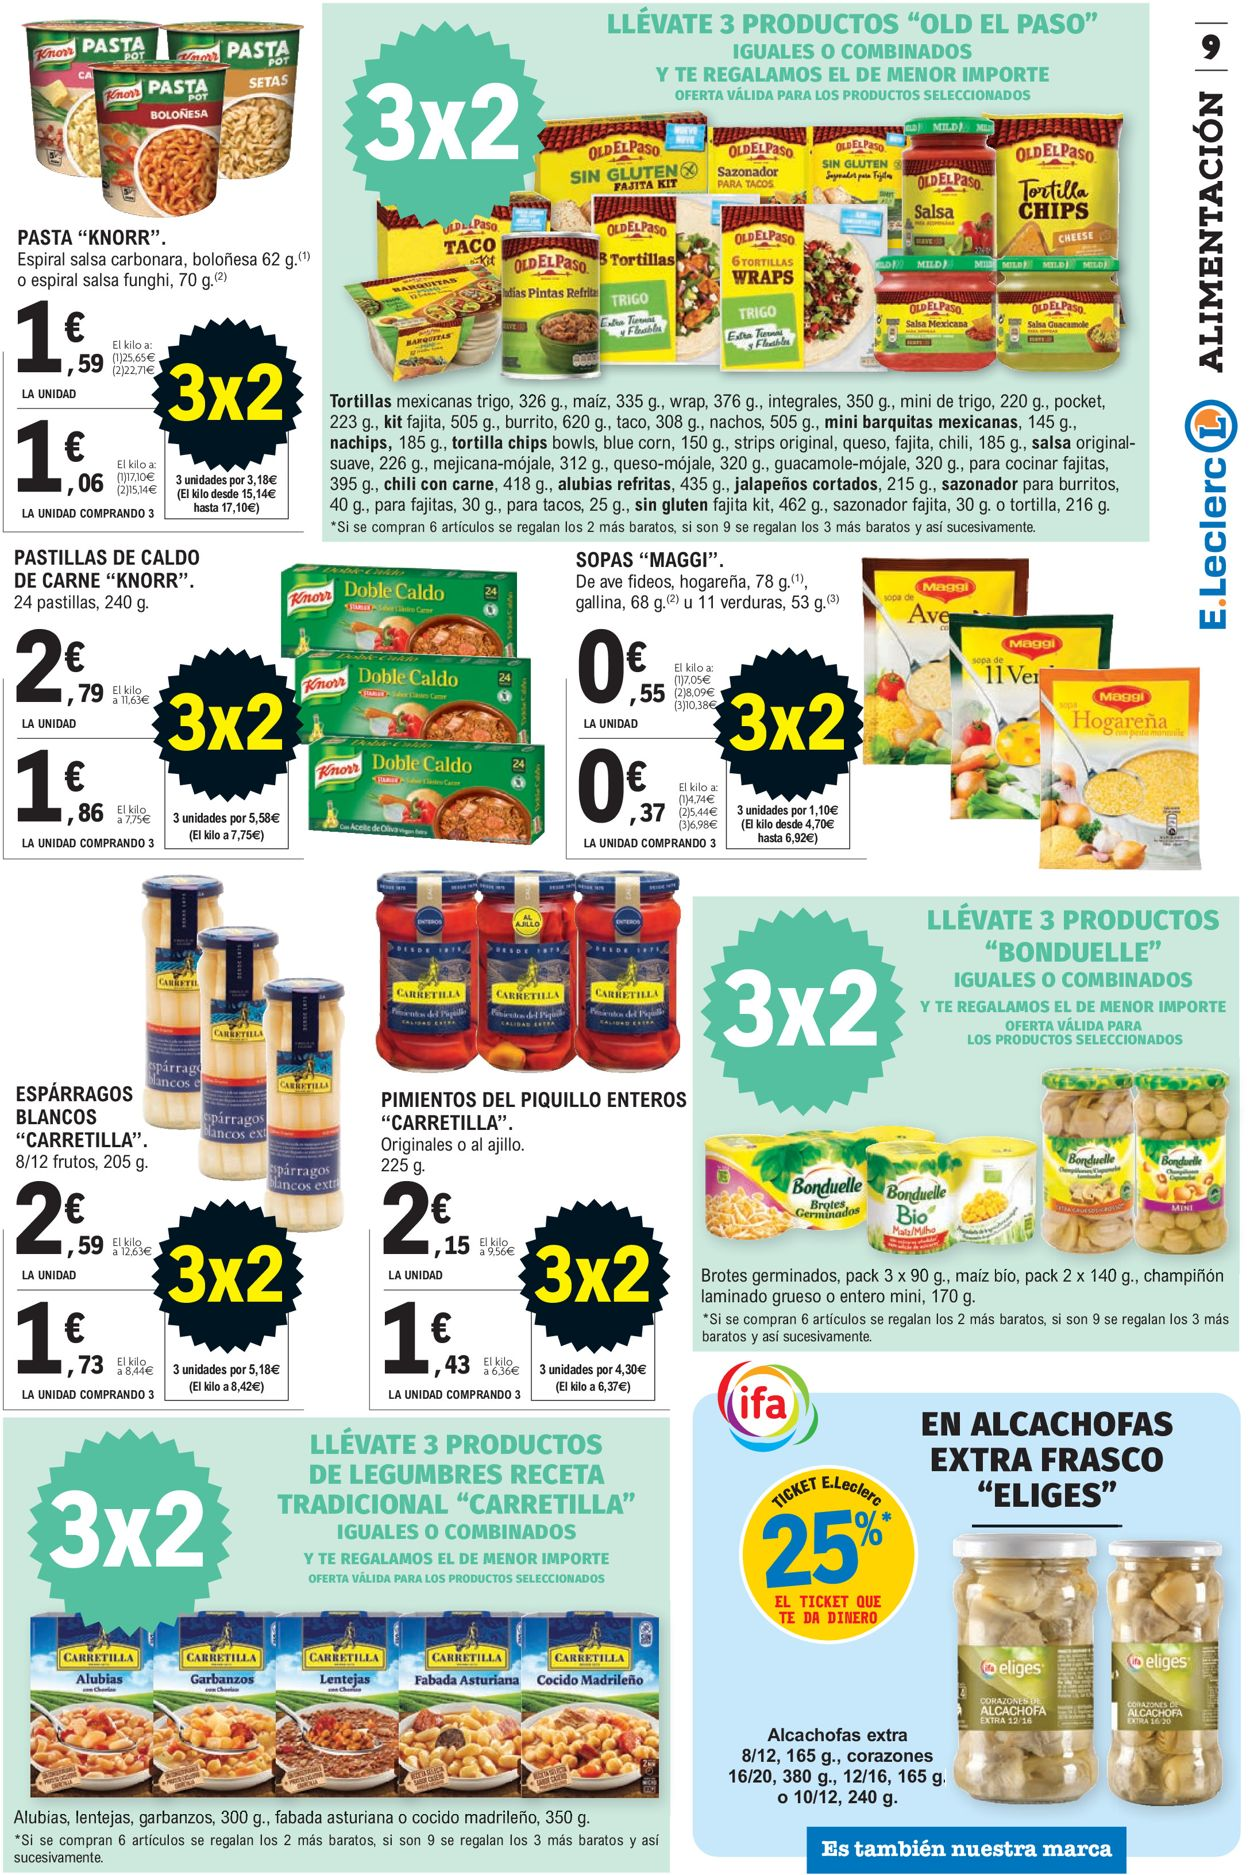 E.leclerc Folleto - 03.02-14.02.2021 (Página 9)